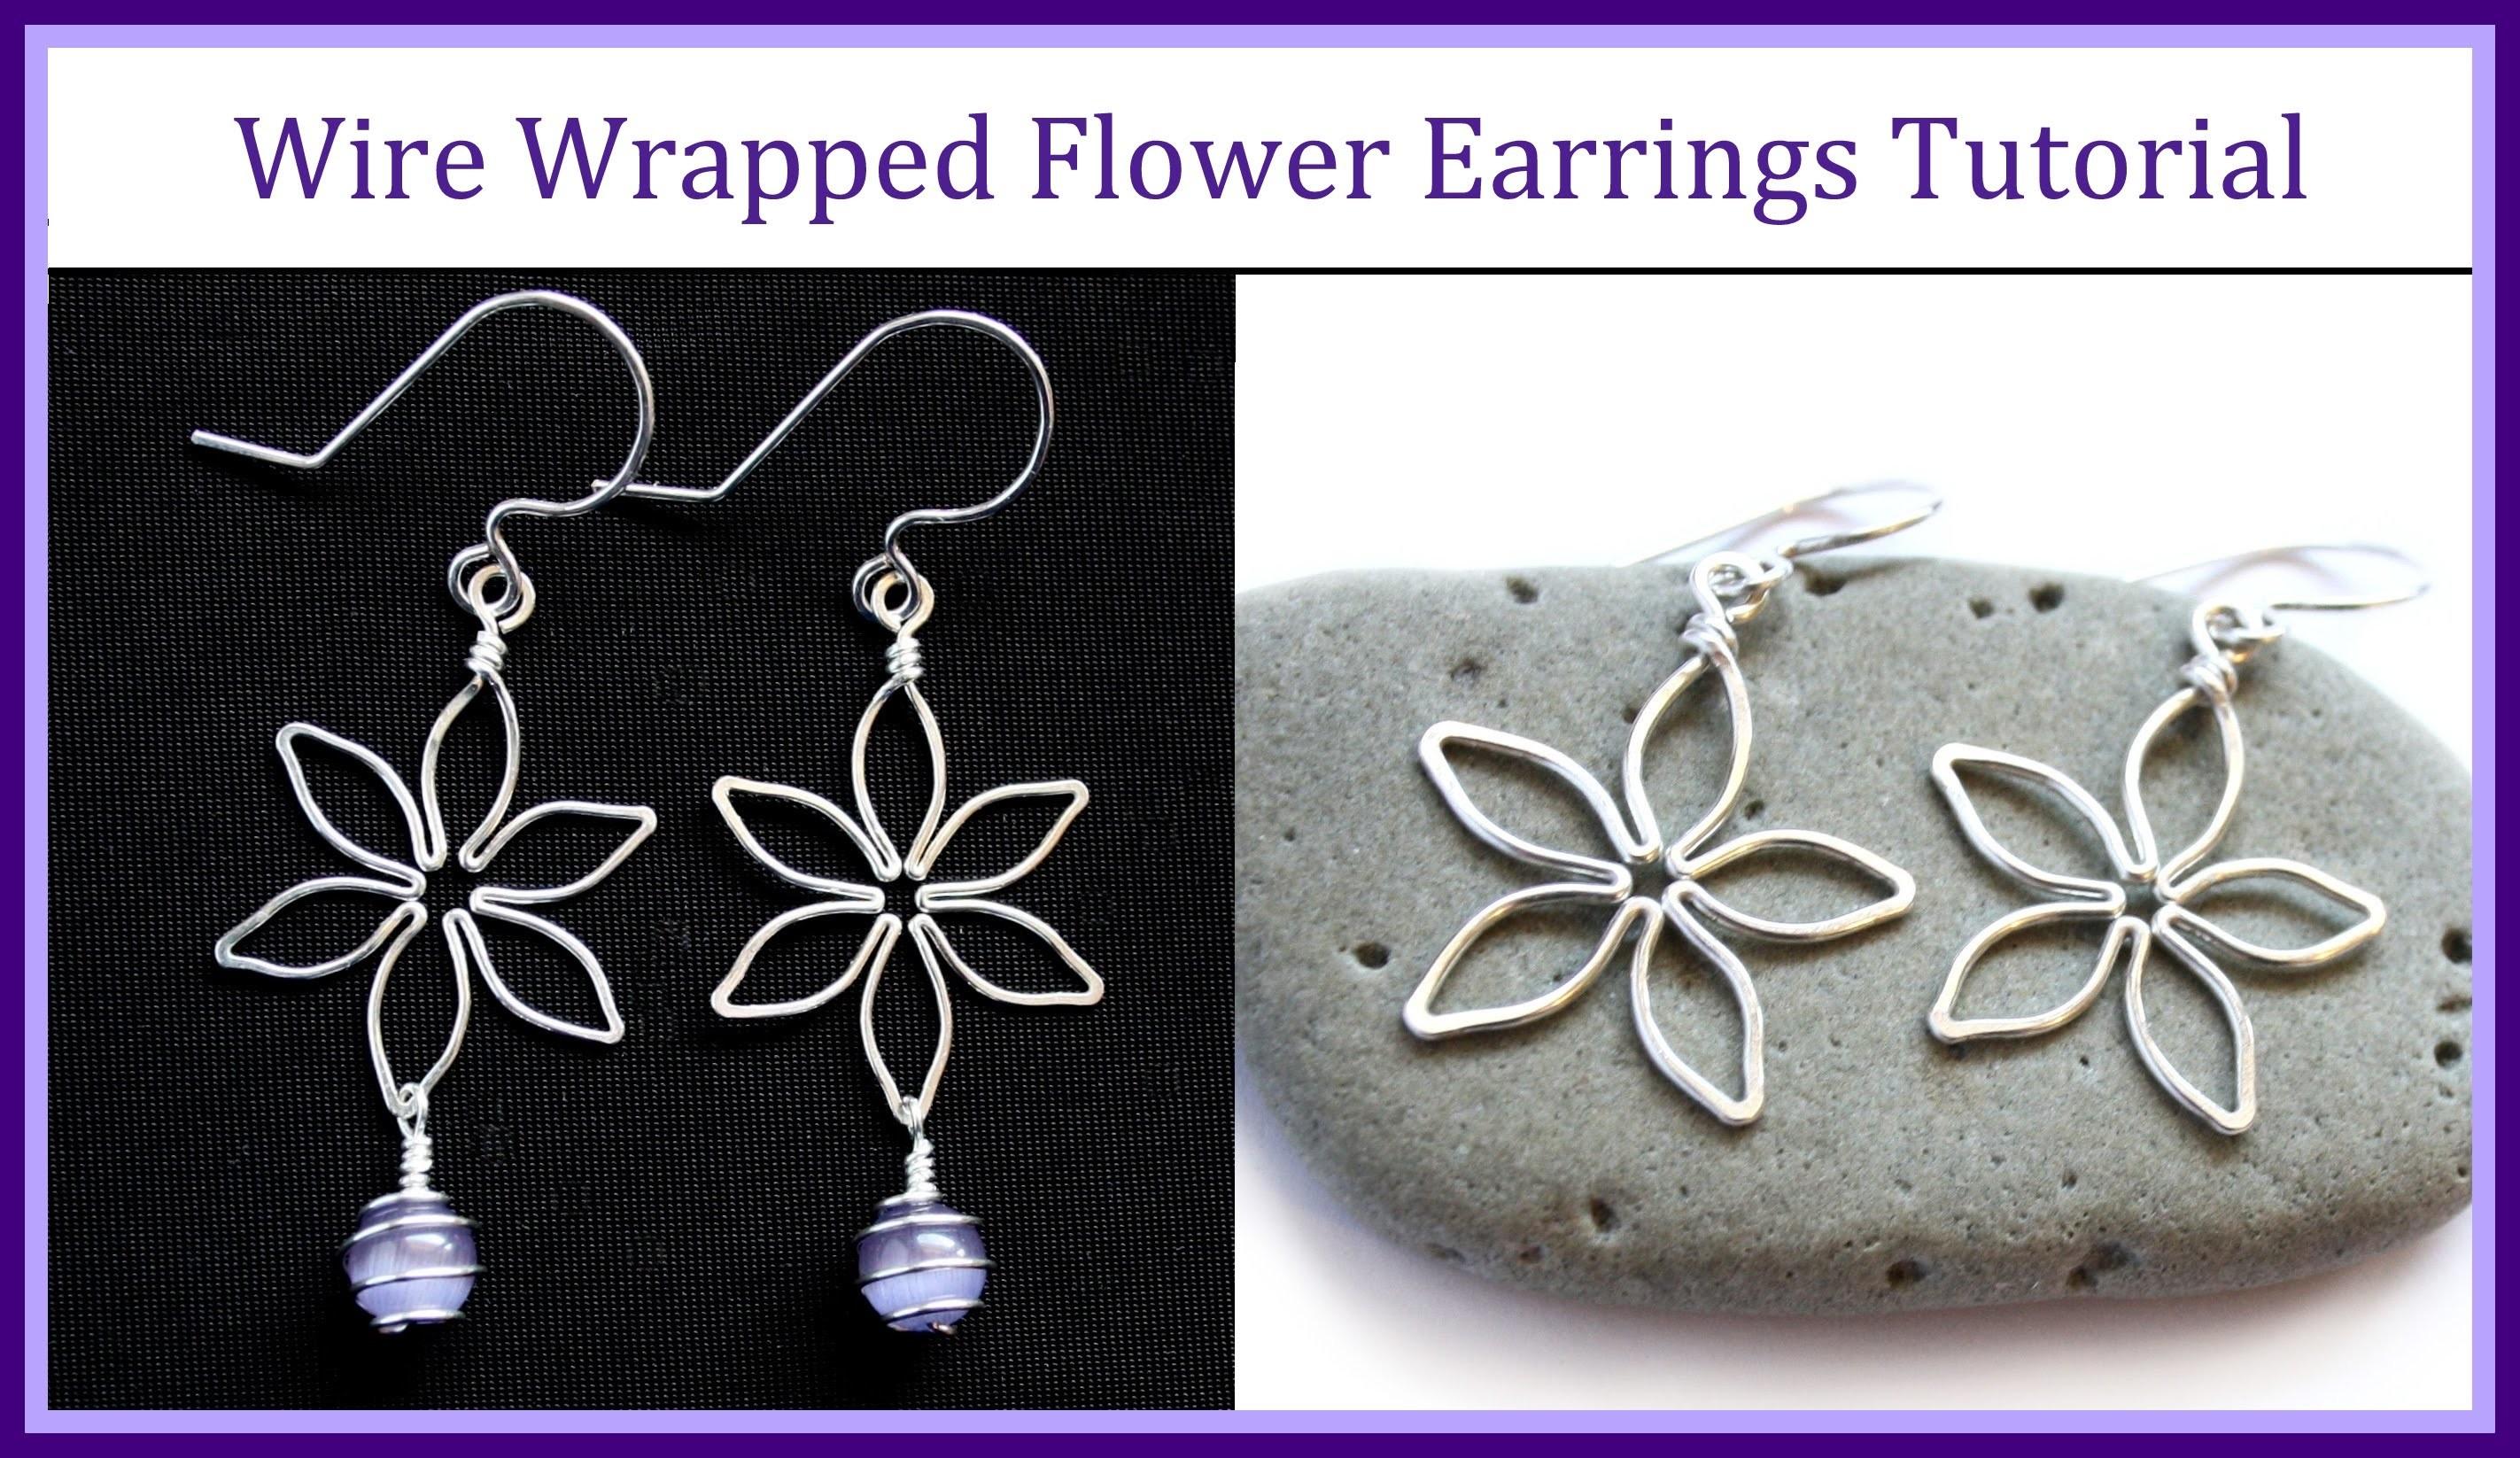 Easy Wire Wrapped Jewelry Tutorial : Flower Earrings Part 2